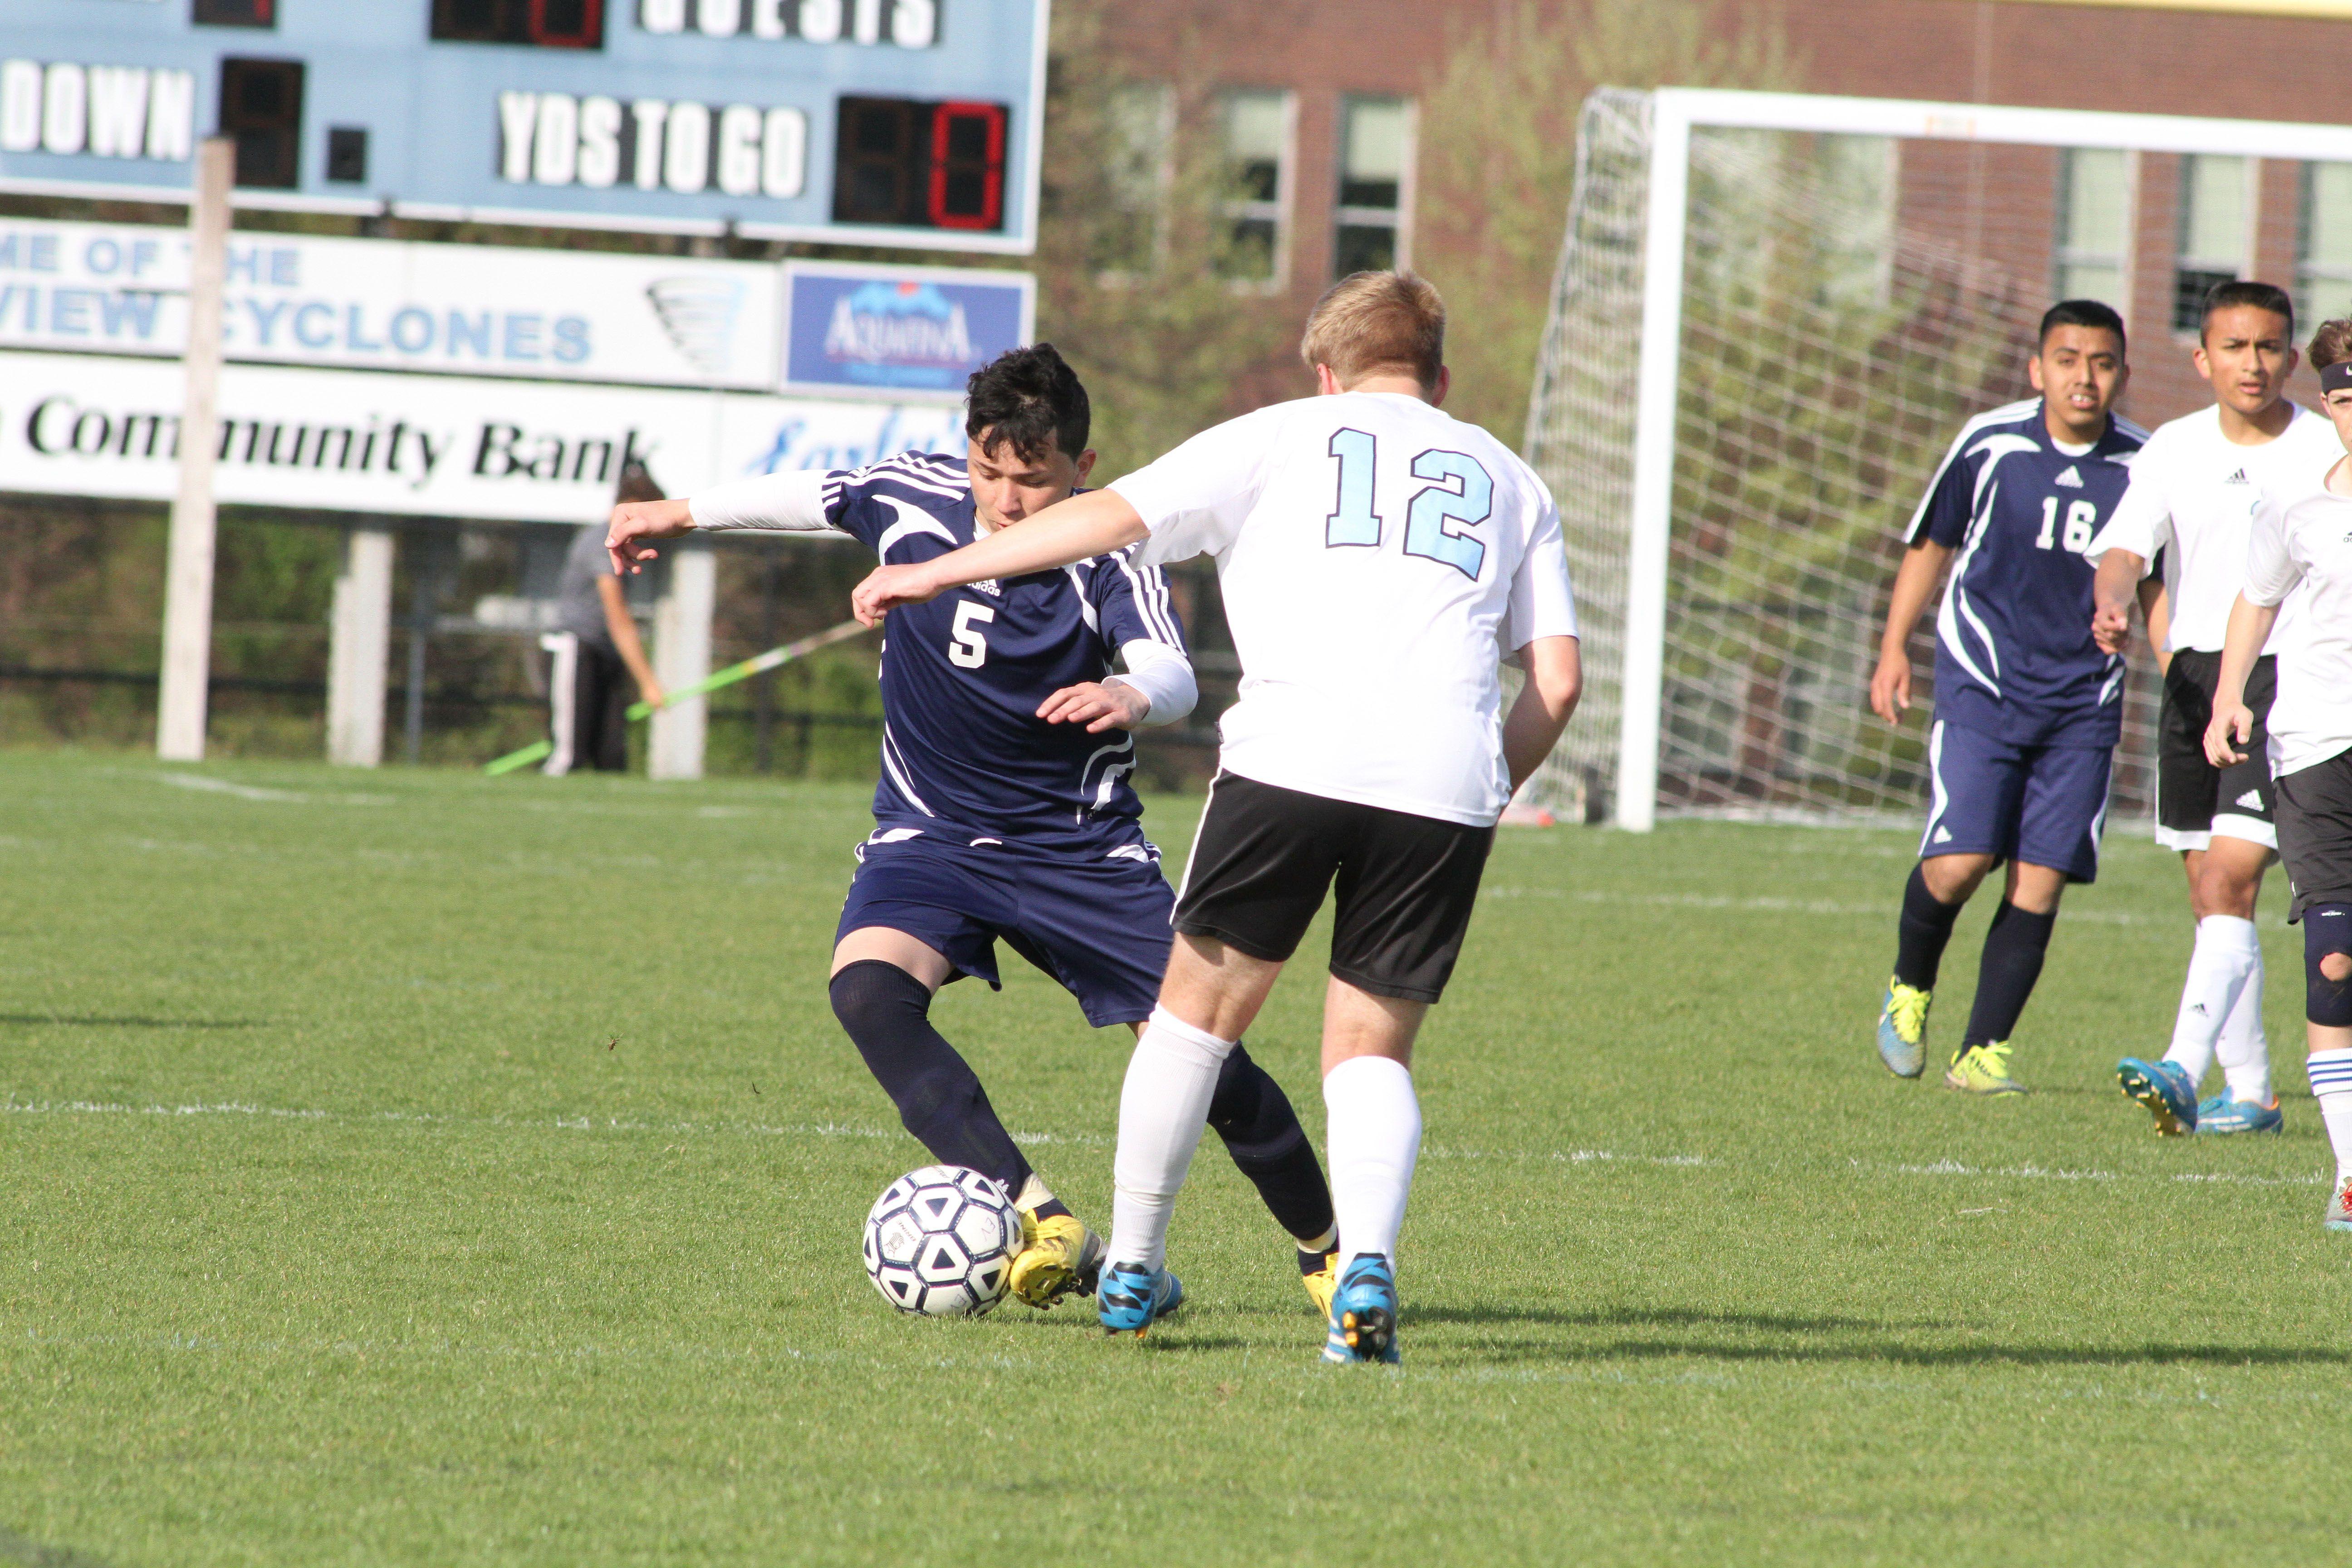 2016_jv_boys soccer soccer boys liberty high school